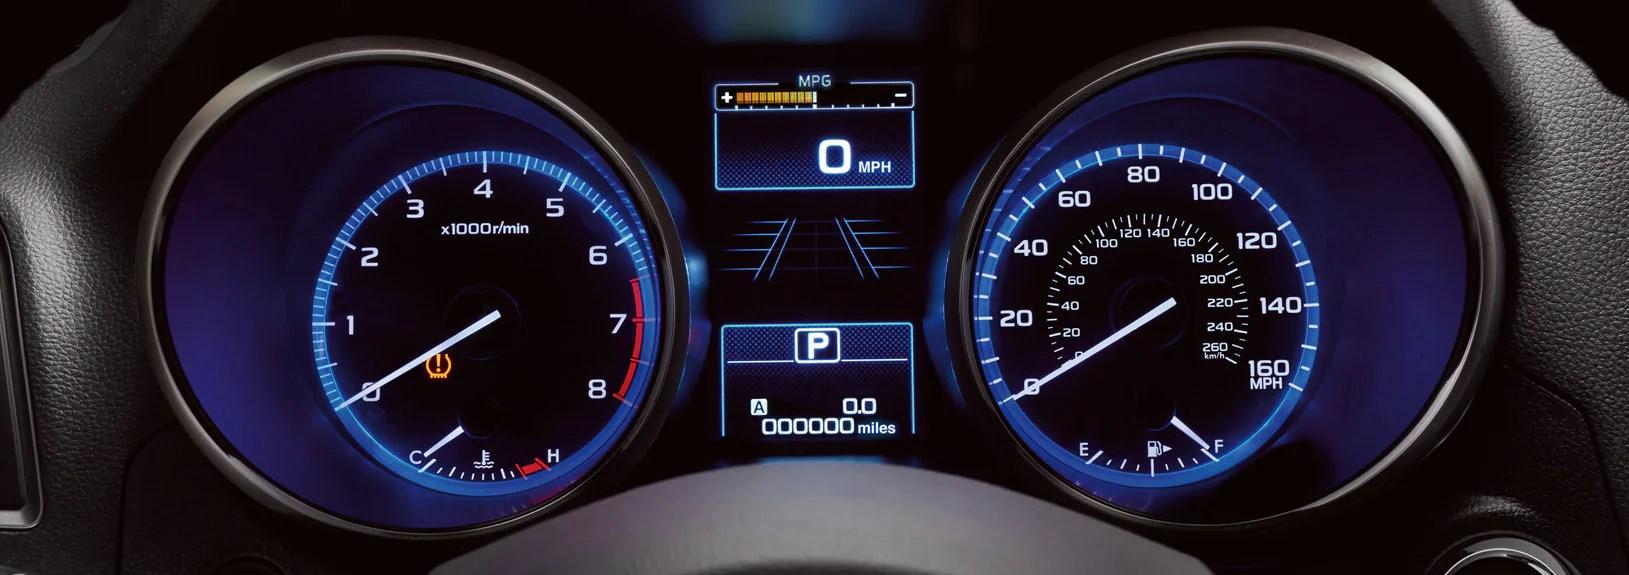 medium resolution of subaru warning indicator lights